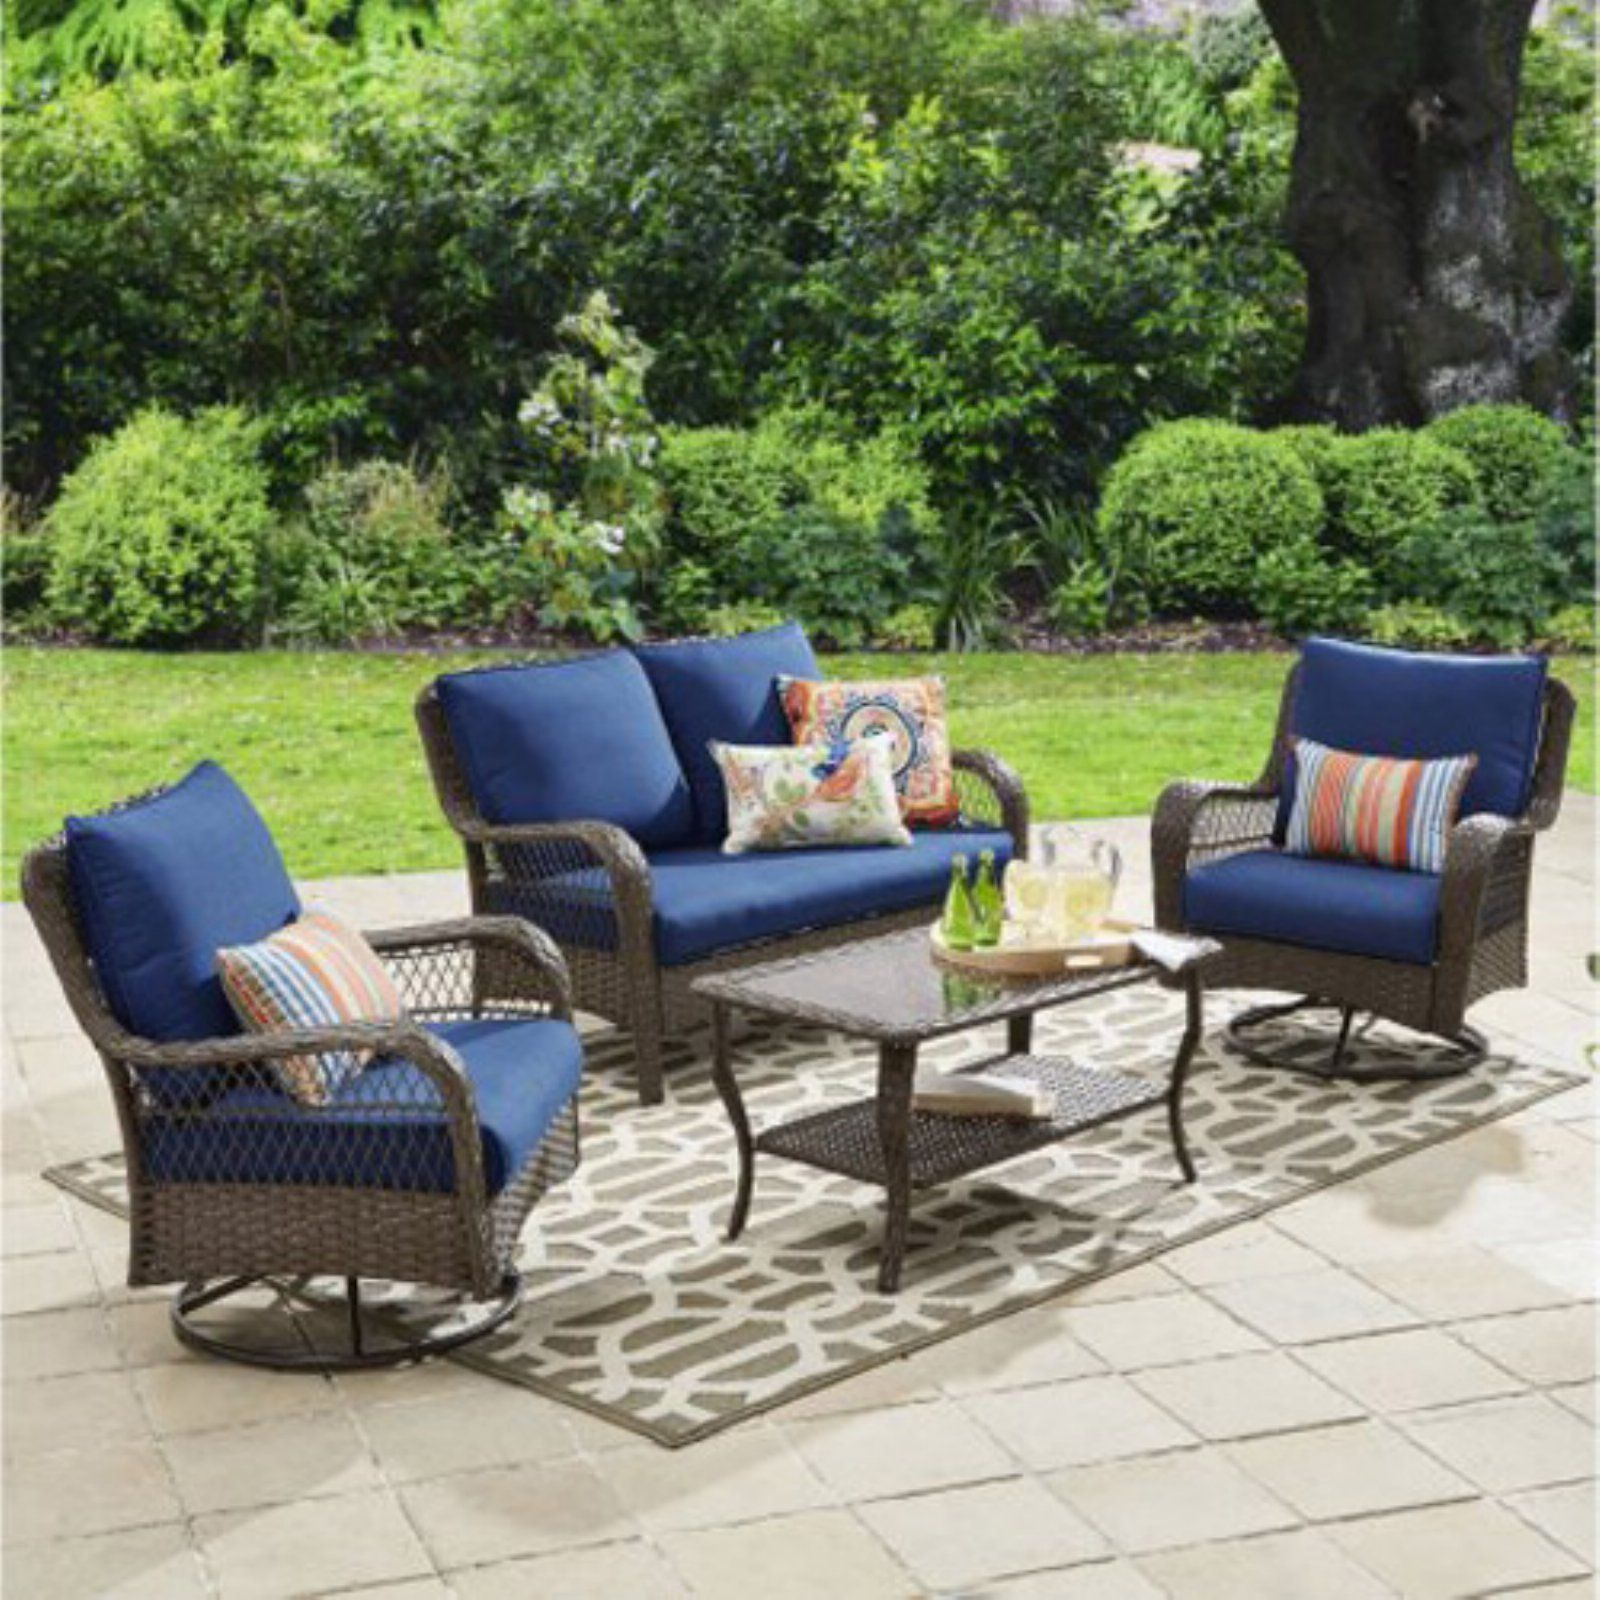 Better Homes Gardens Colebrook 4 Piece Outdoor Conversation Set